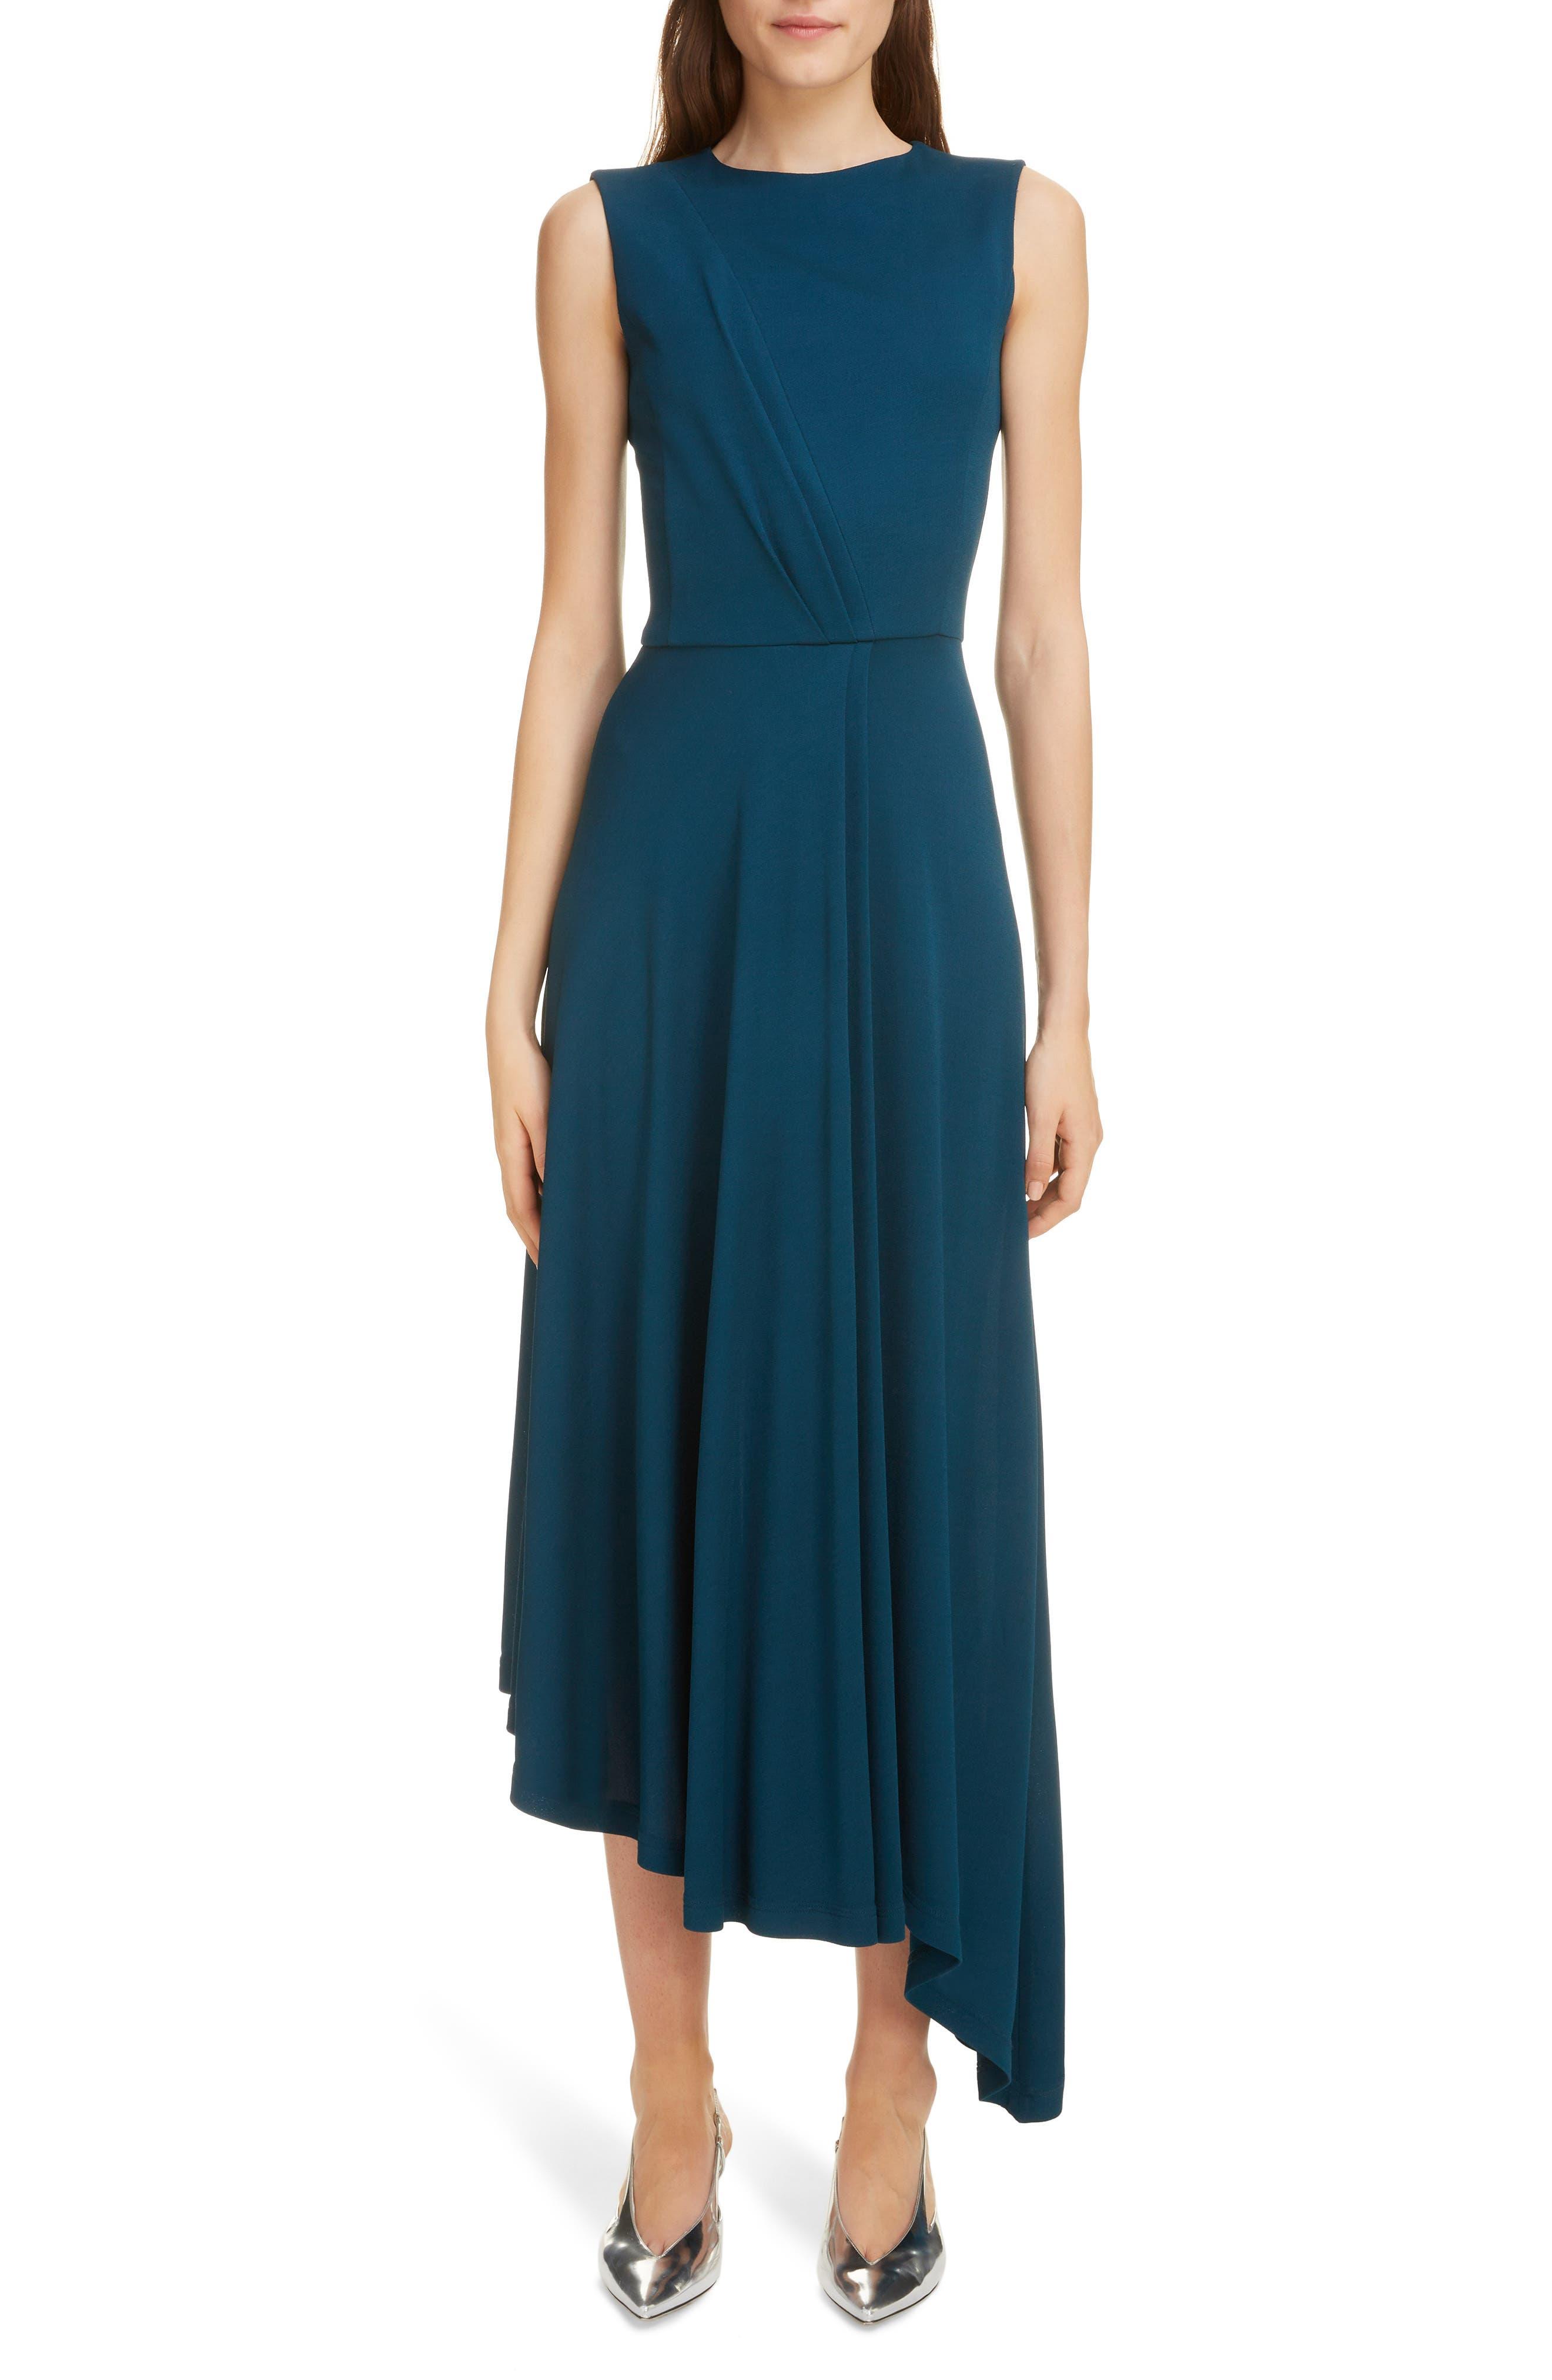 Givenchy Gathered Jersey Midi Dress, 8 FR - Blue